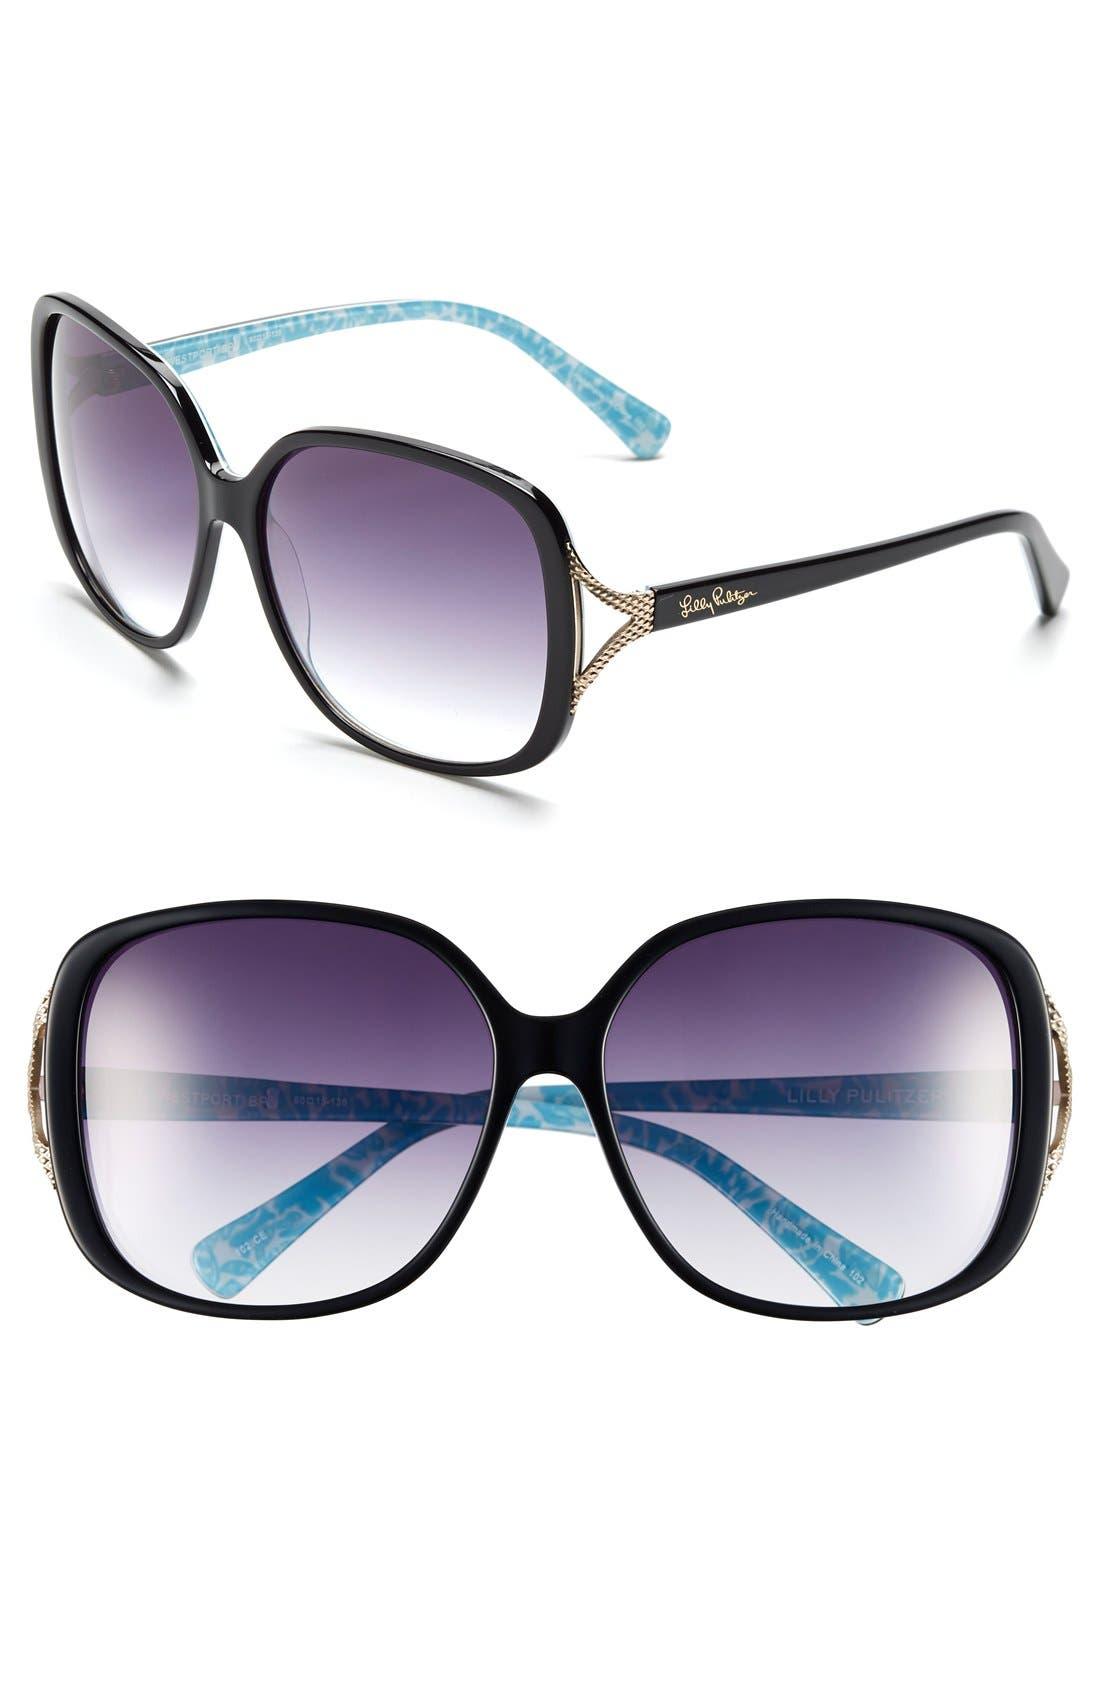 Main Image - Lilly Pulitzer® 'Westport' 60mm Sunglasses